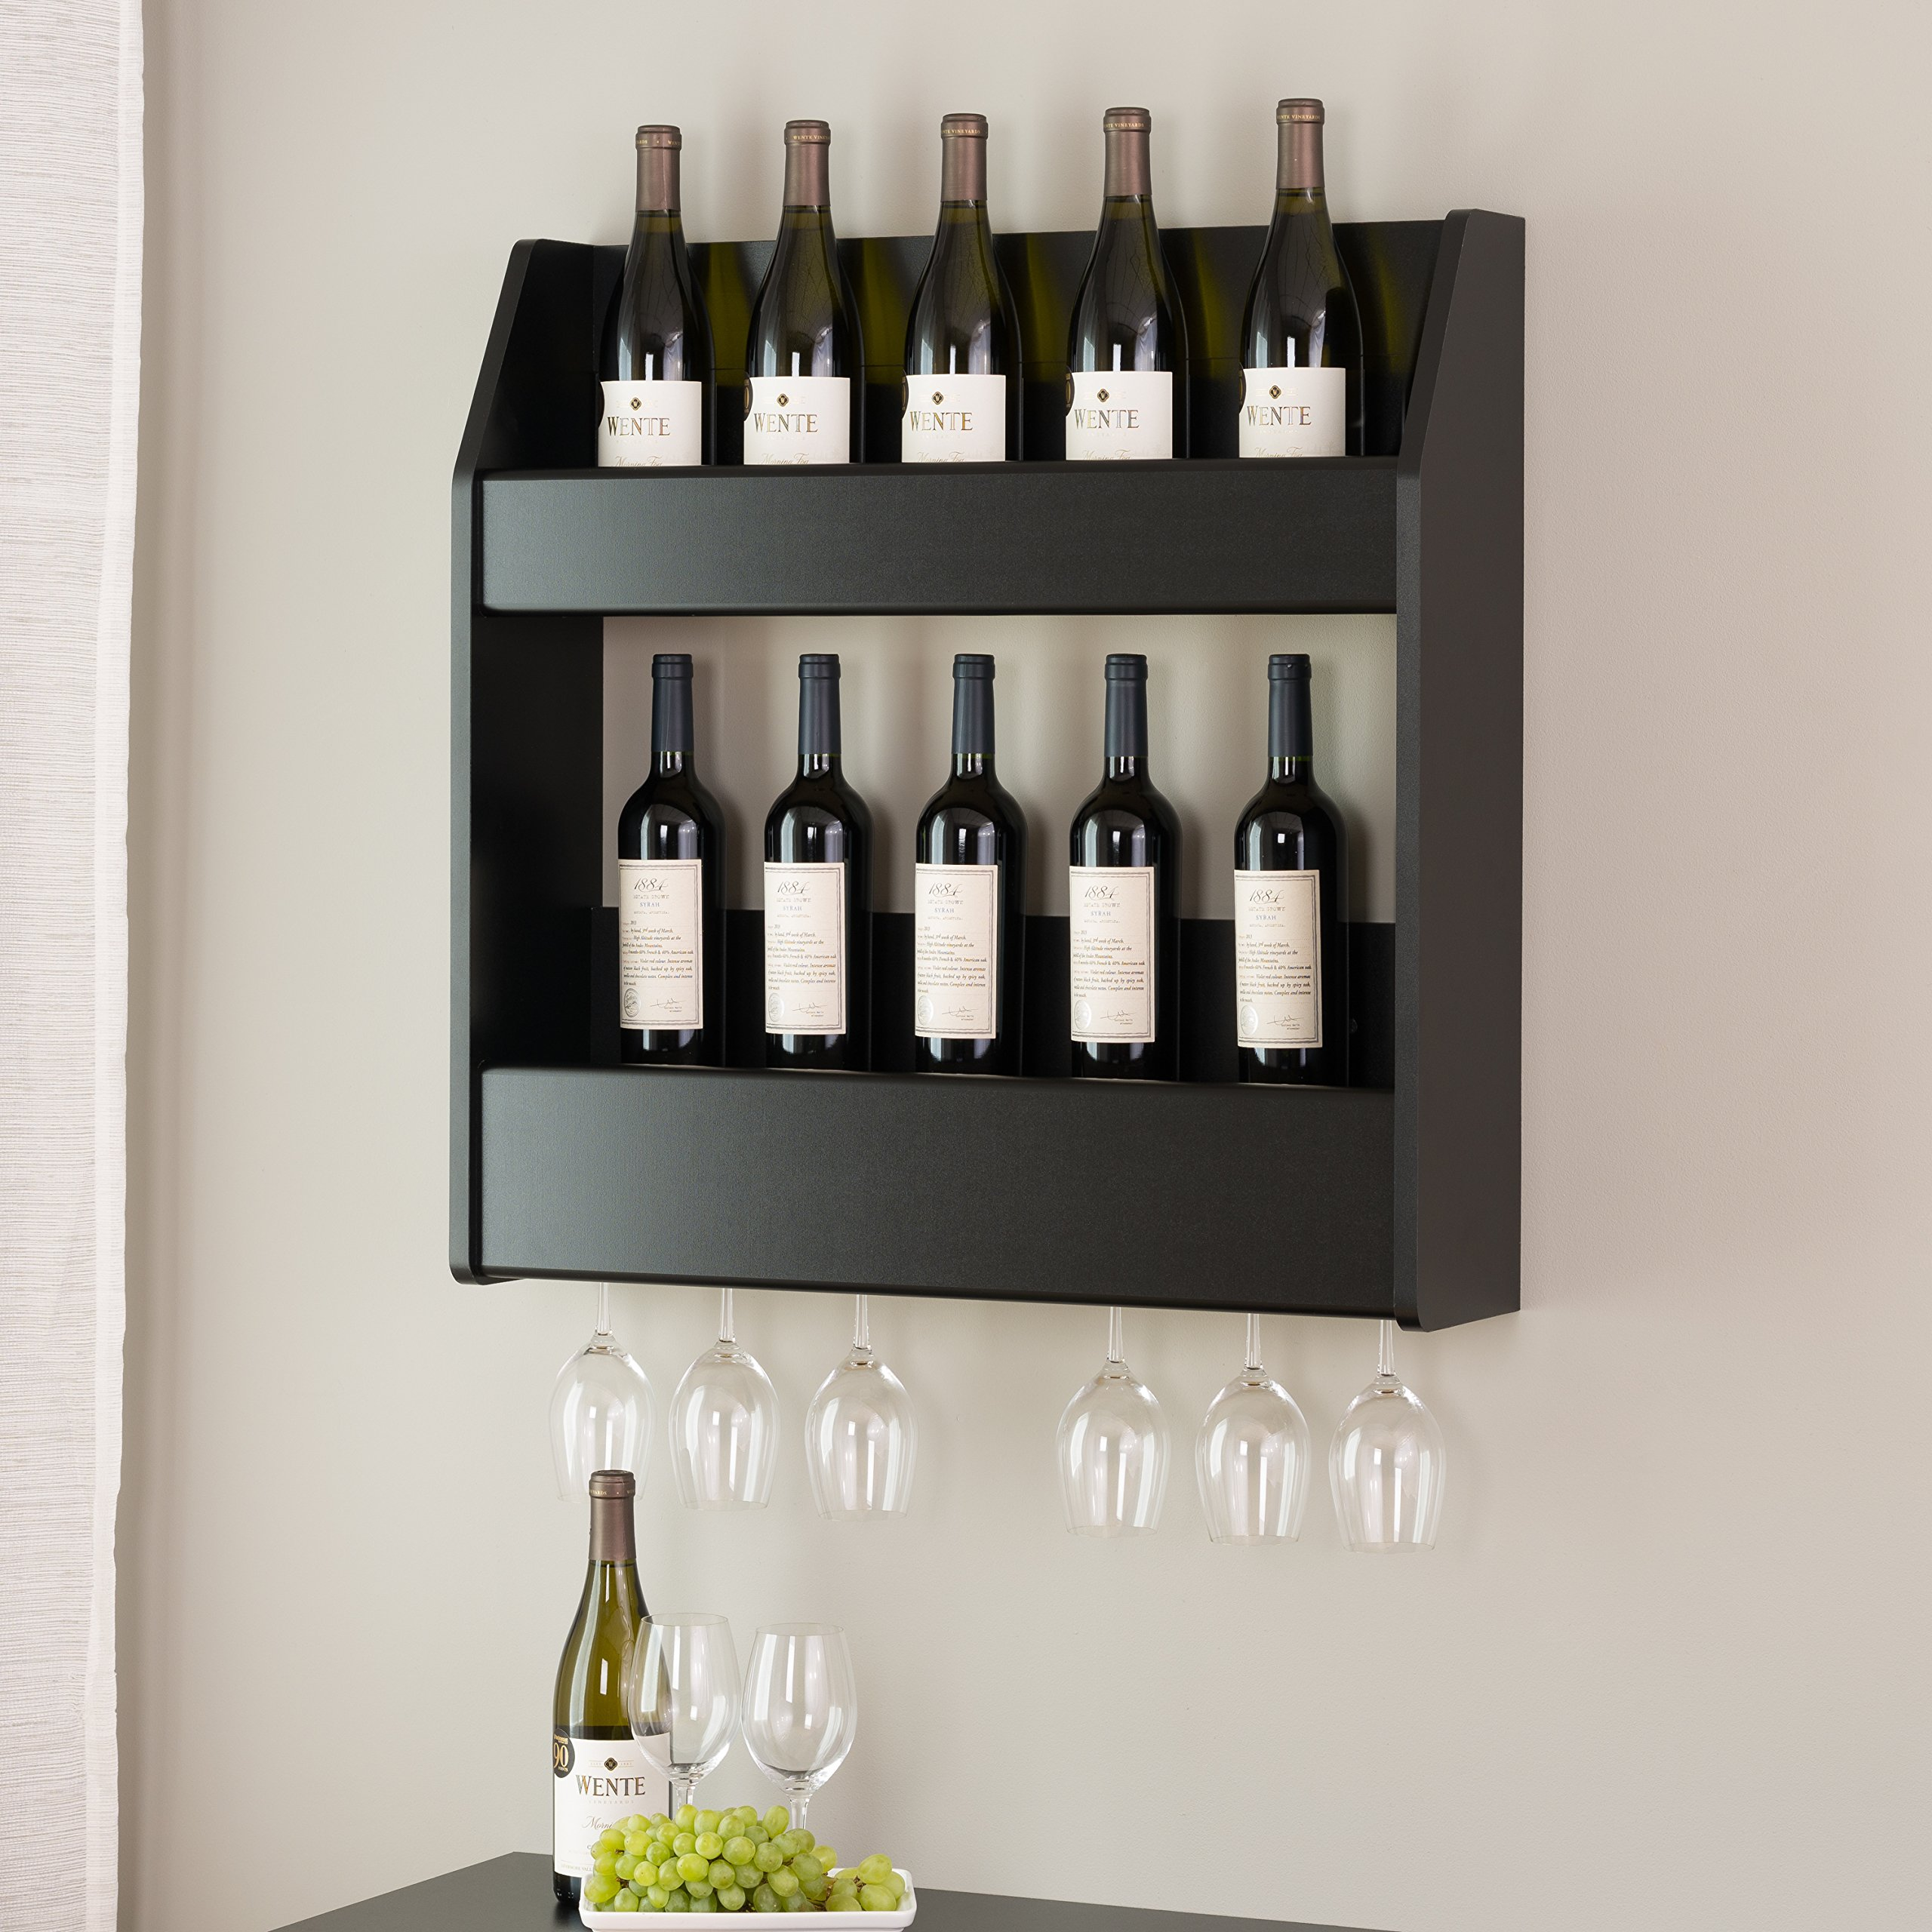 Floating Wine Rack Liquor Bottle Storage Glass Holder Bar Wall Mount Pub Sturdy Black Modern Holds 20 Bottles